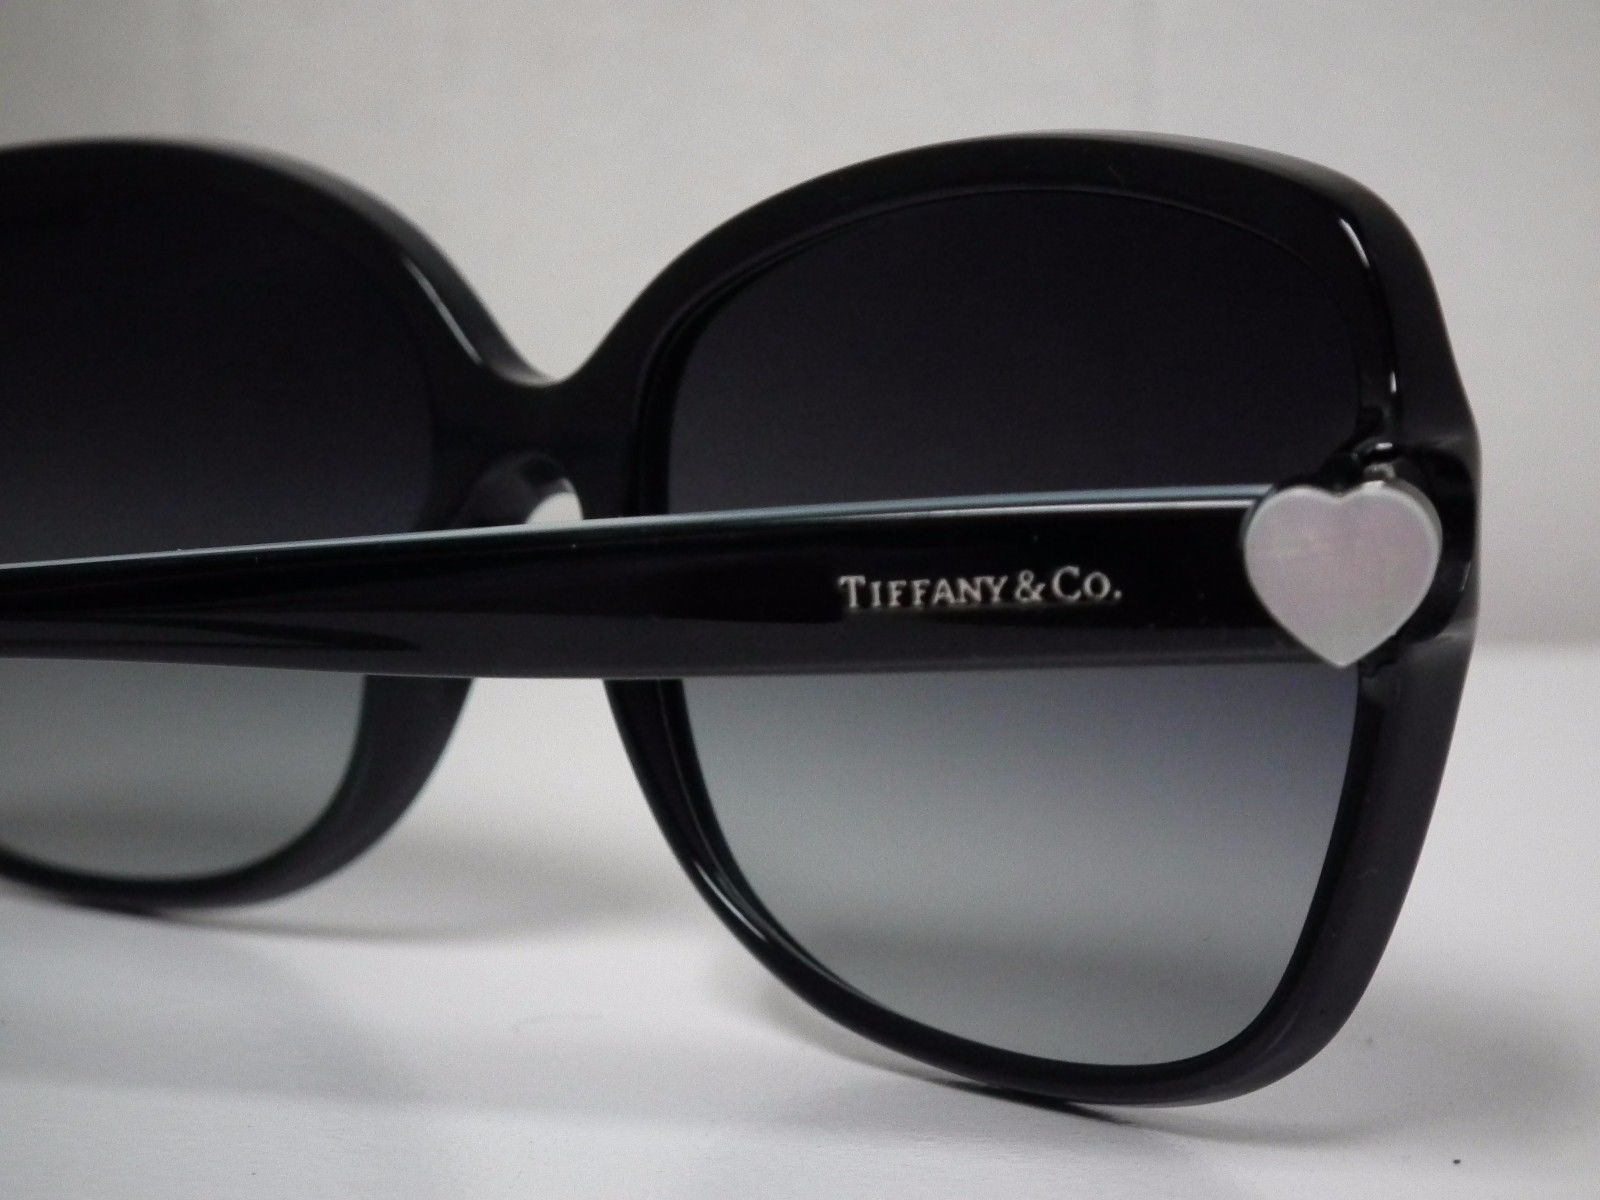 Authentic Women's Tiffany & Co TF4085-H 8001/3C Black Sunglasses-Retail $395 https://t.co/39lr8IwCio https://t.co/FLhWsIOFUU